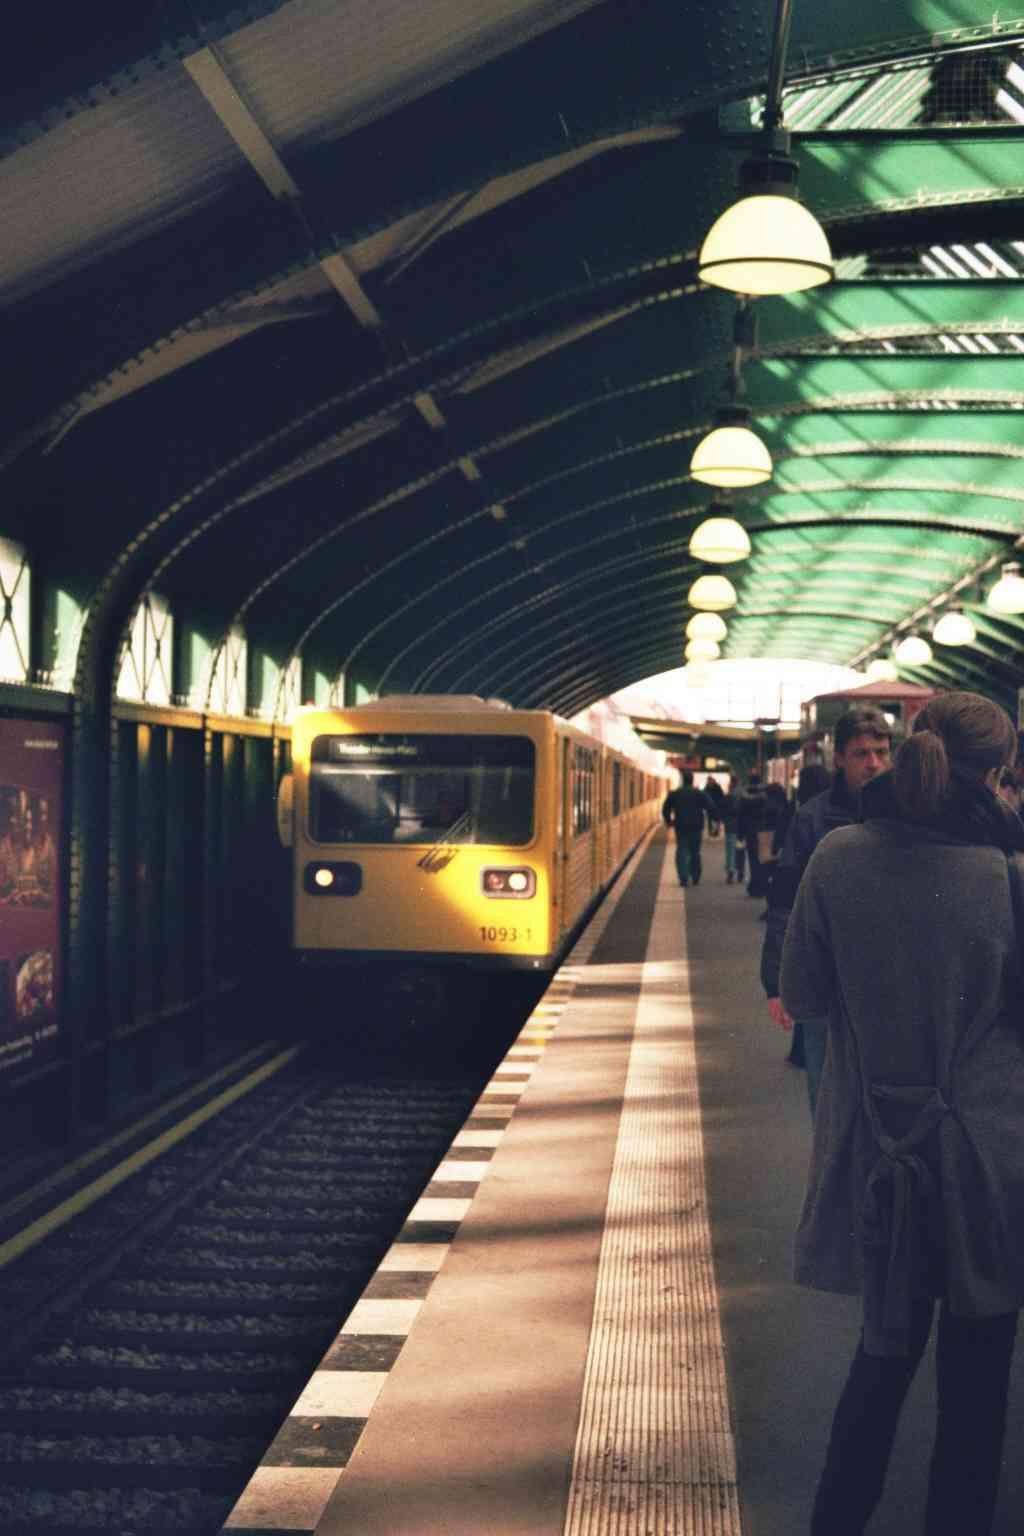 U-Bahn à Berlin - Station de métro aérien -:Eberswalder Straße Station sur la U2